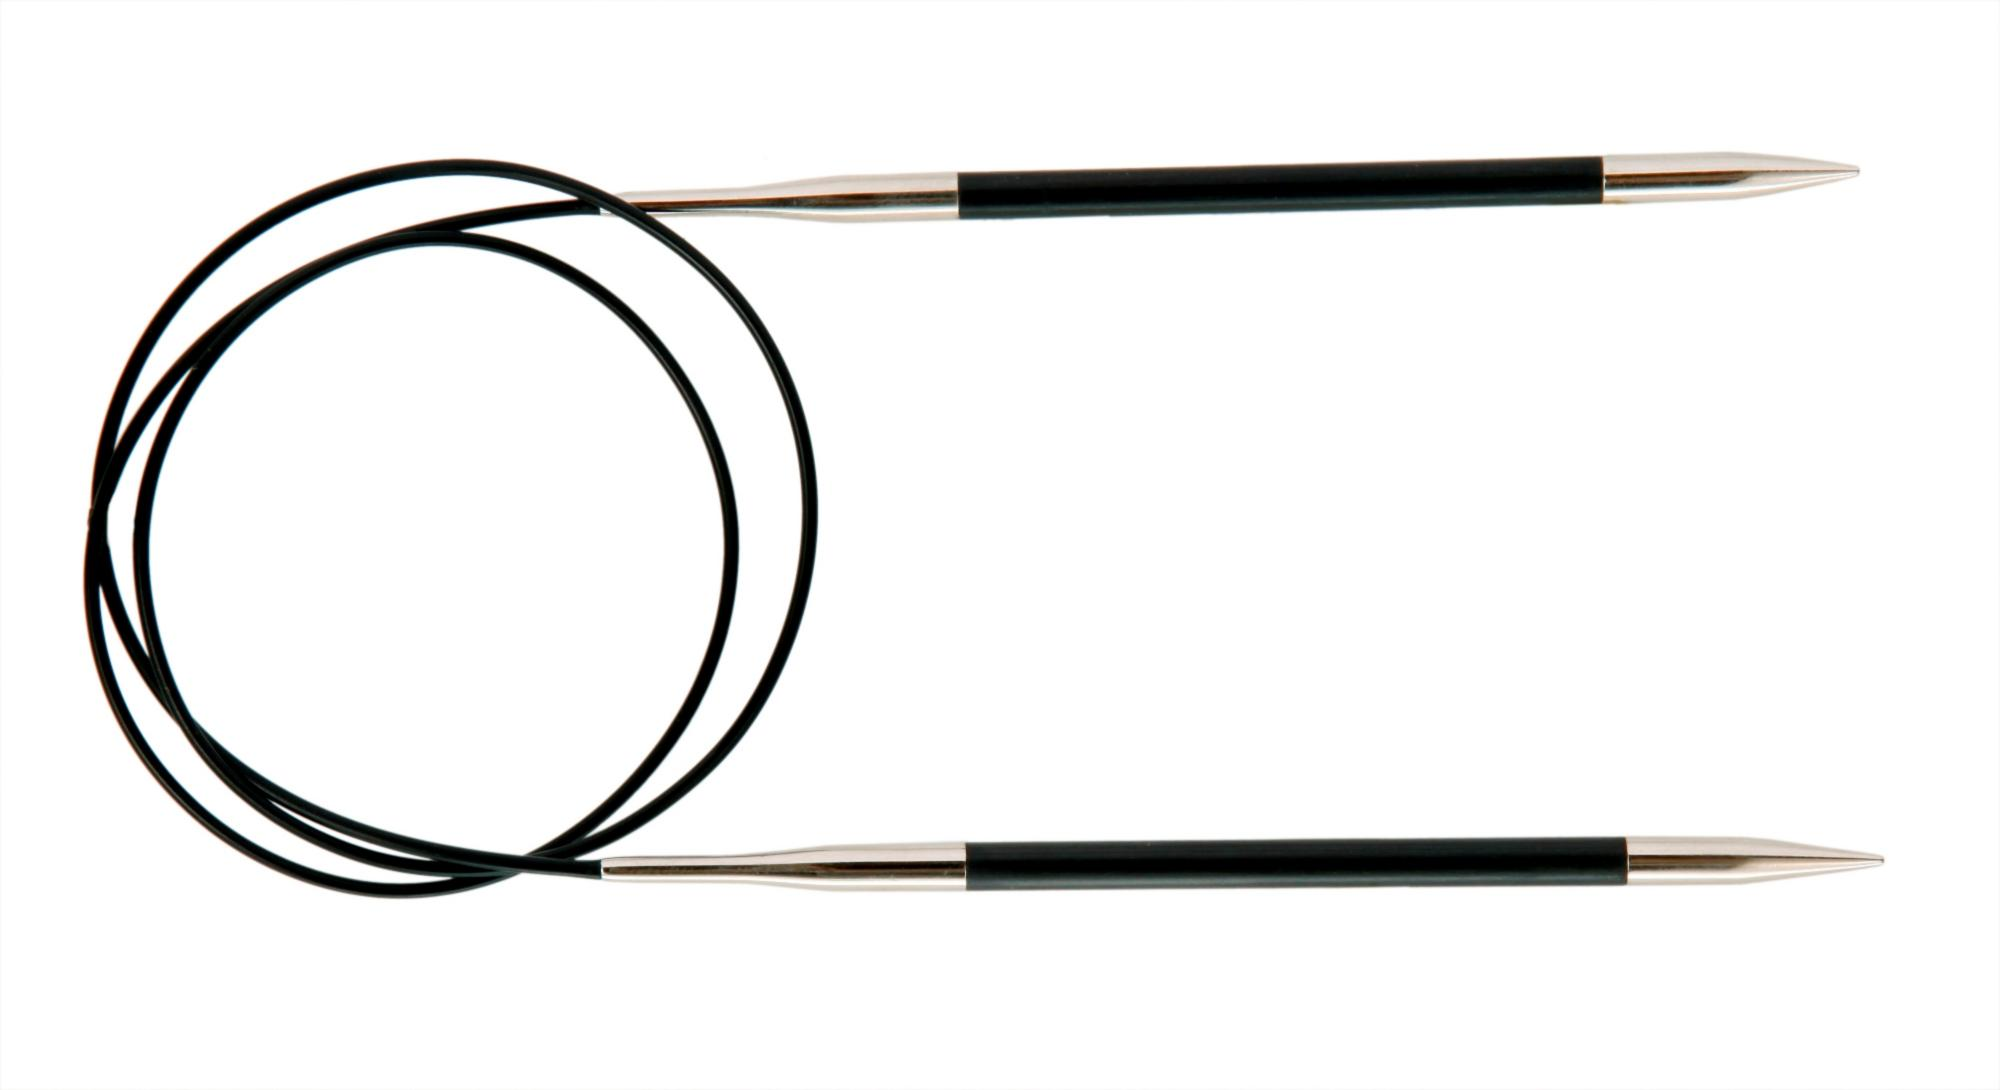 Спицы круговые 60 см Karbonz KnitPro, 41161, 2.25 мм